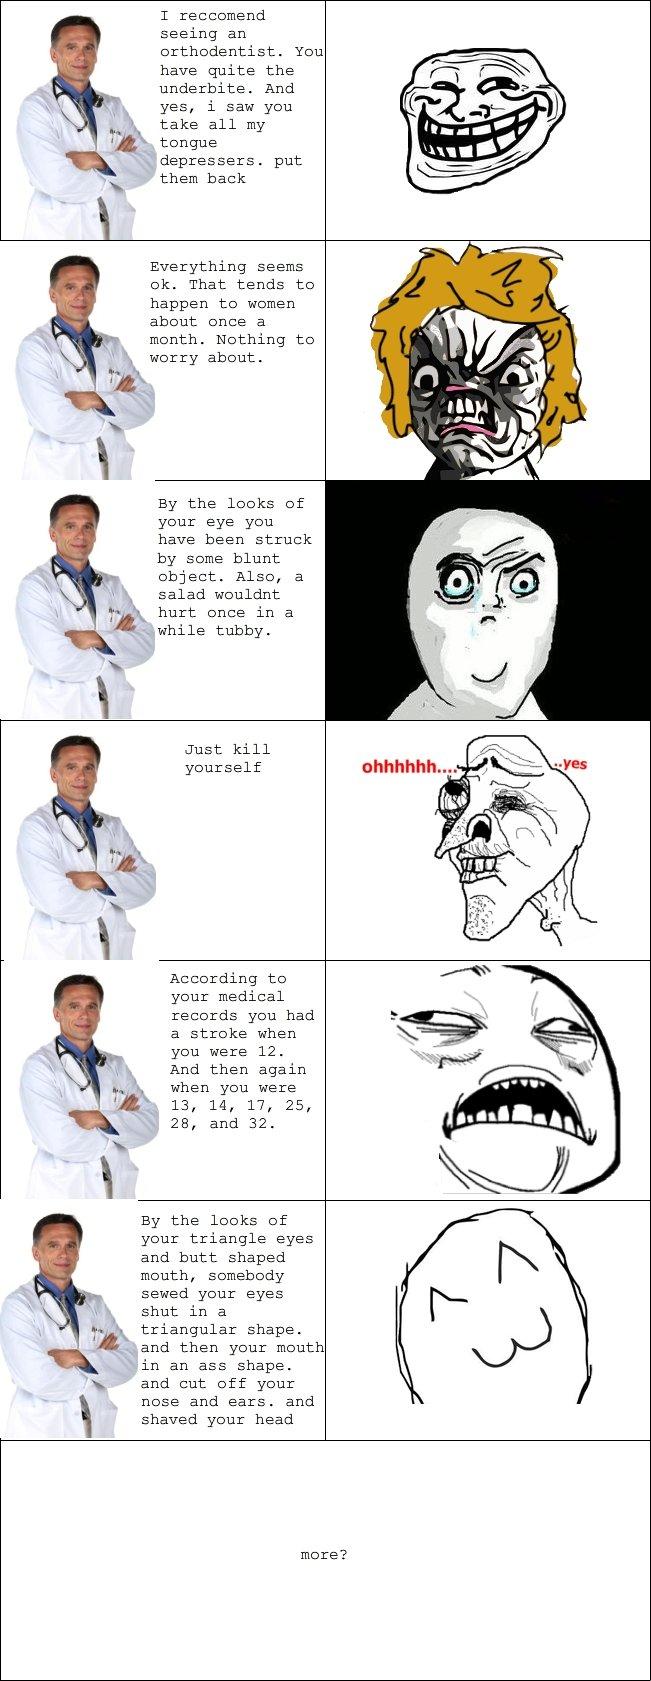 Meme Diagnosis Part 2. part tre possibly? part 1: /funny_pictures/2384390/Meme+Diagnosis/. T reccomend seeing an You have guite the underbite. And yes, l saw yo Meme Diagnosis